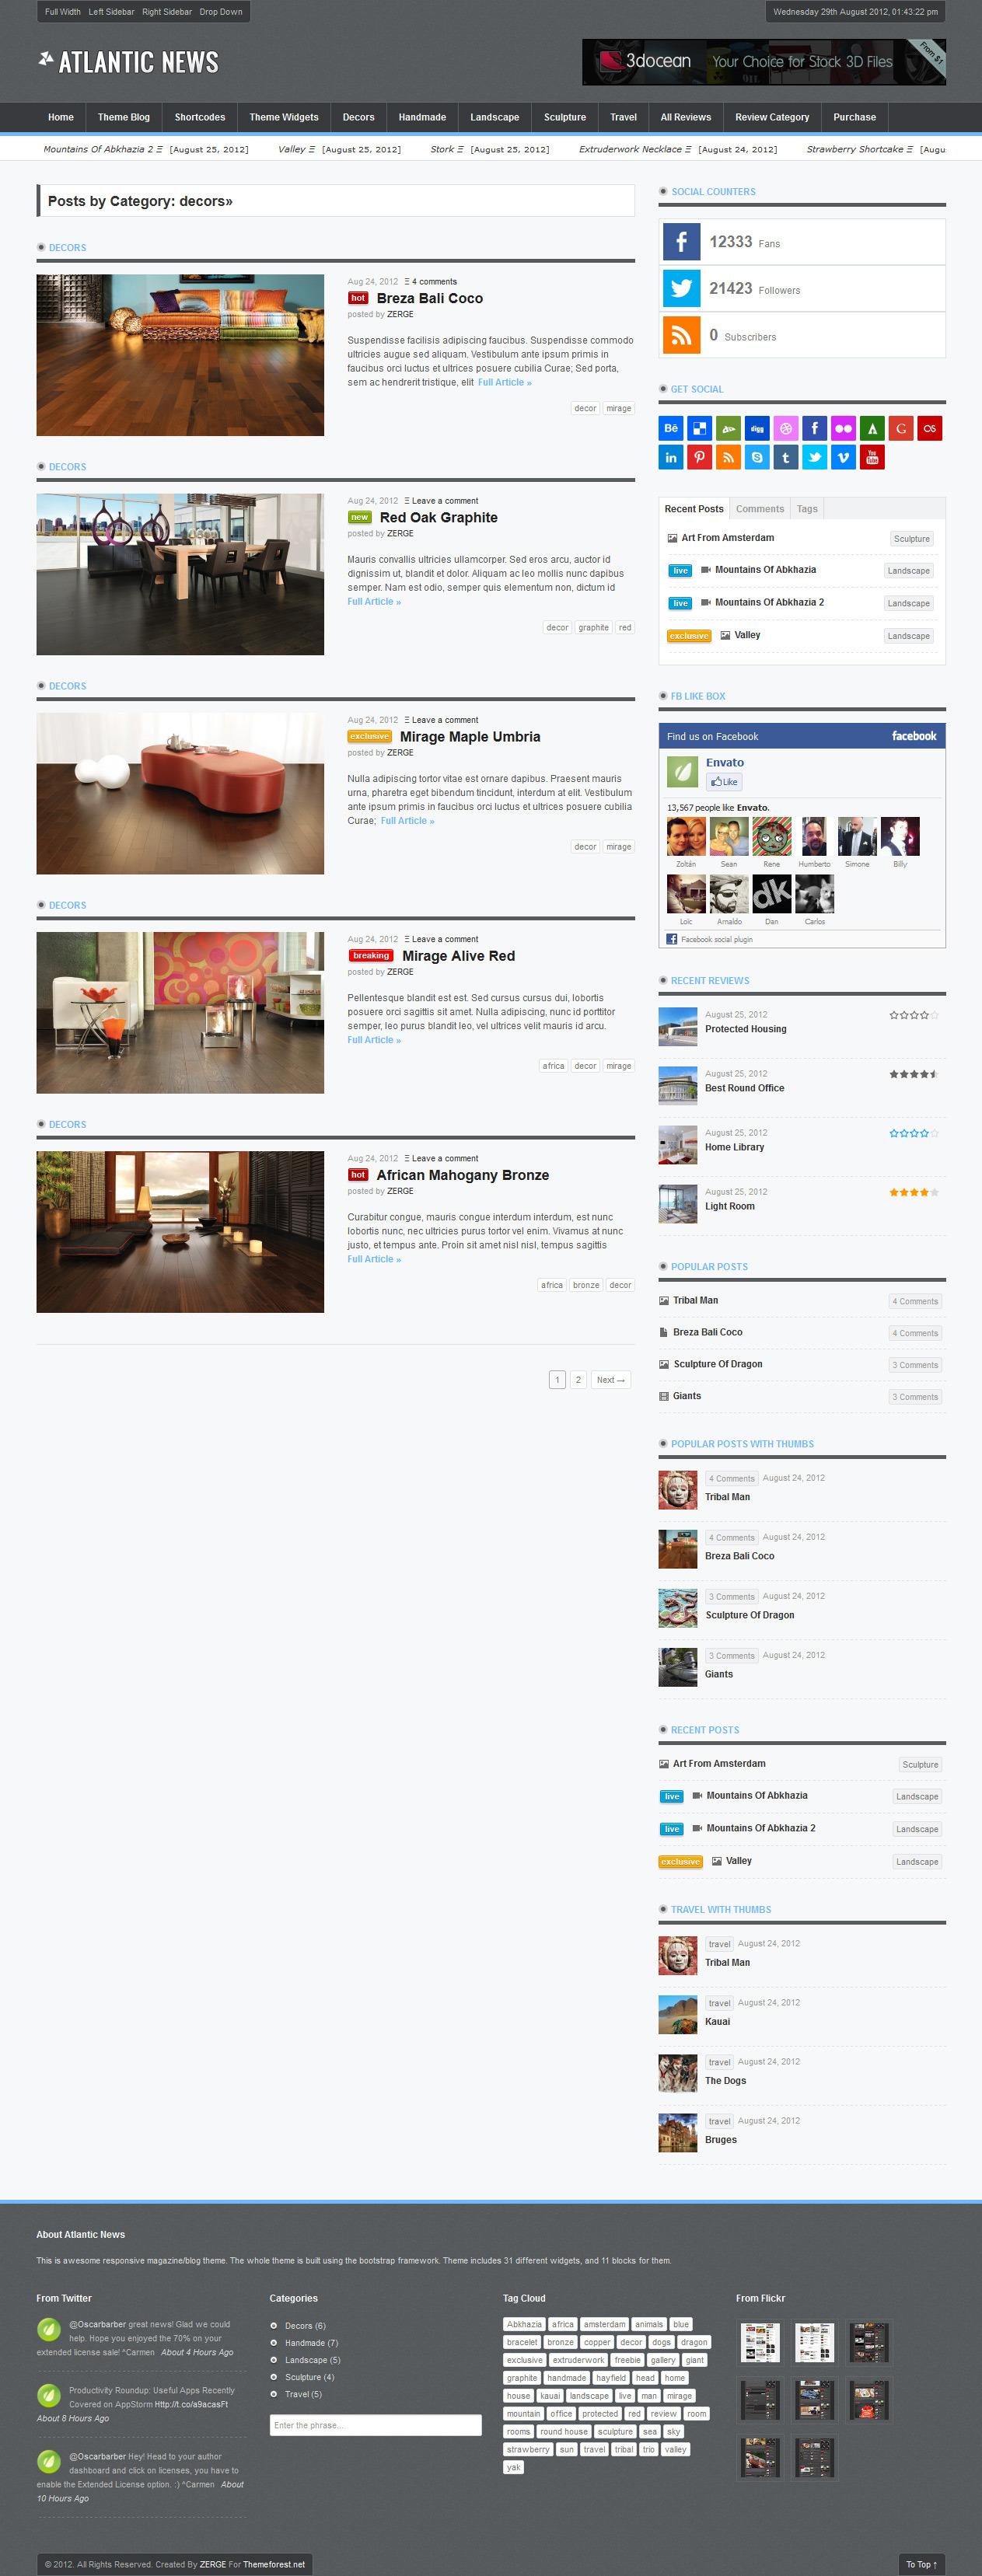 Atlantic News - Responsive WordPress Magazine Blog - 04_Category